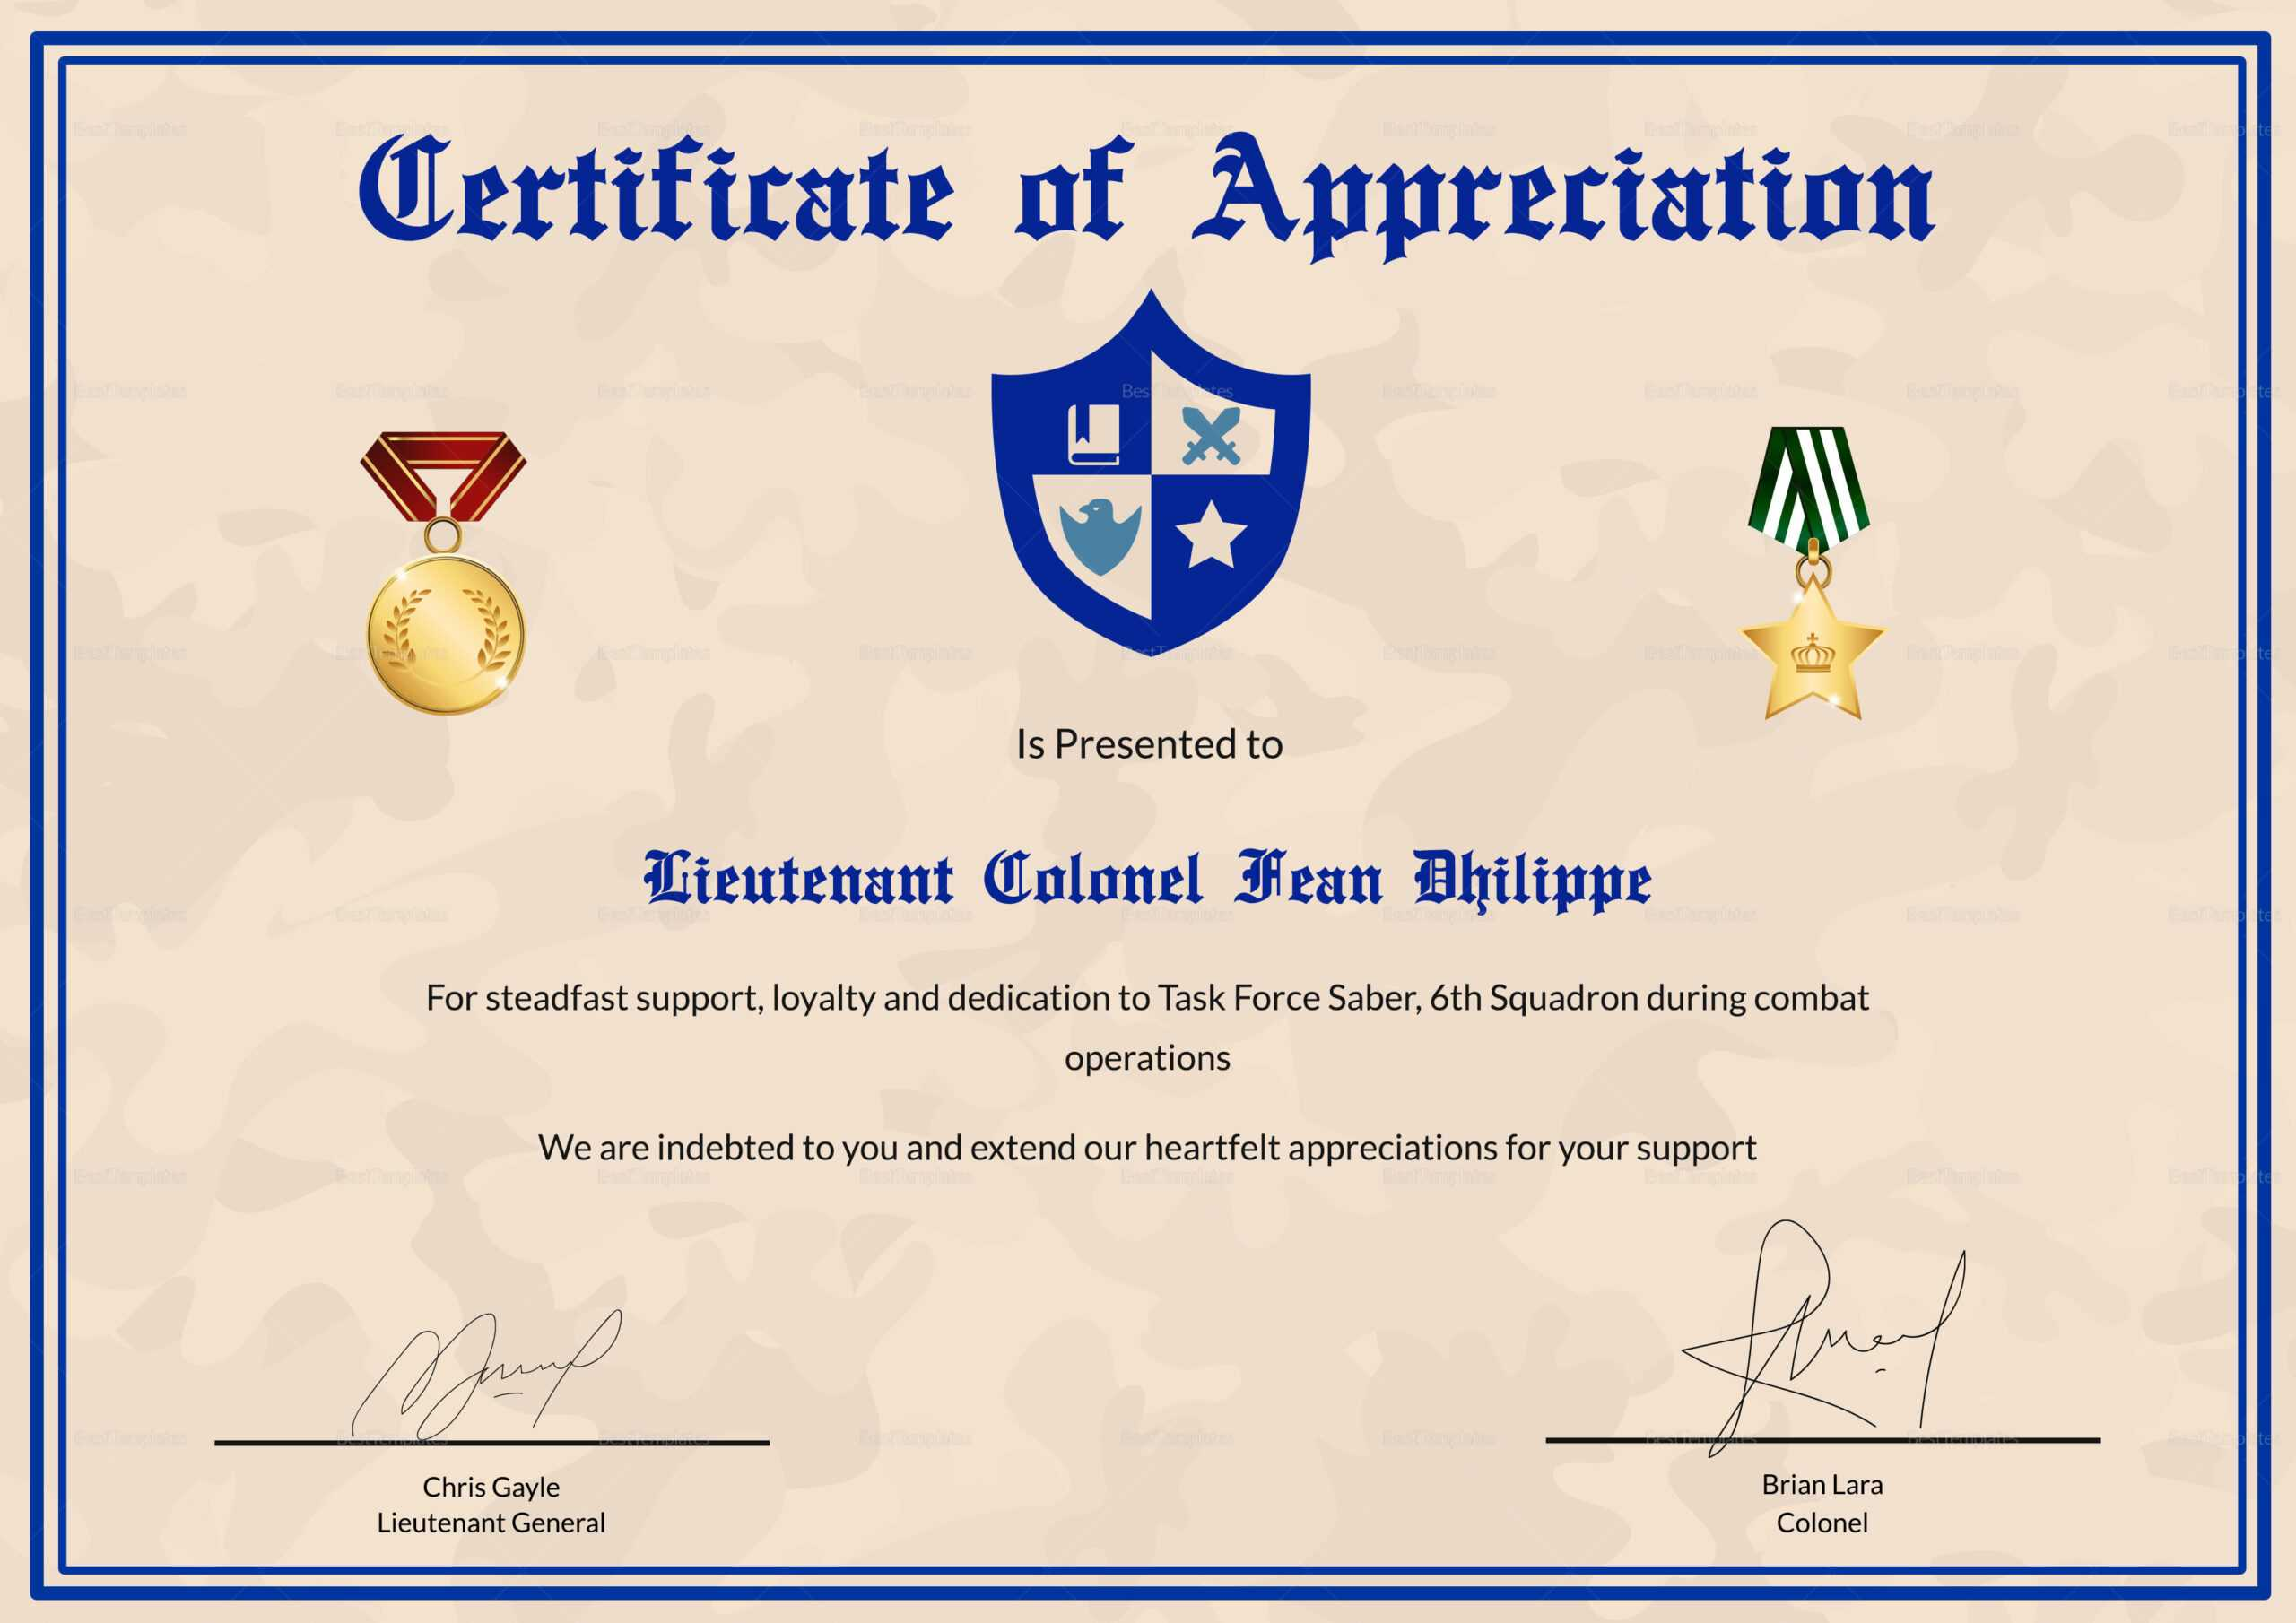 Army Certificate Of Appreciation Template Throughout Army Certificate Of Appreciation Template